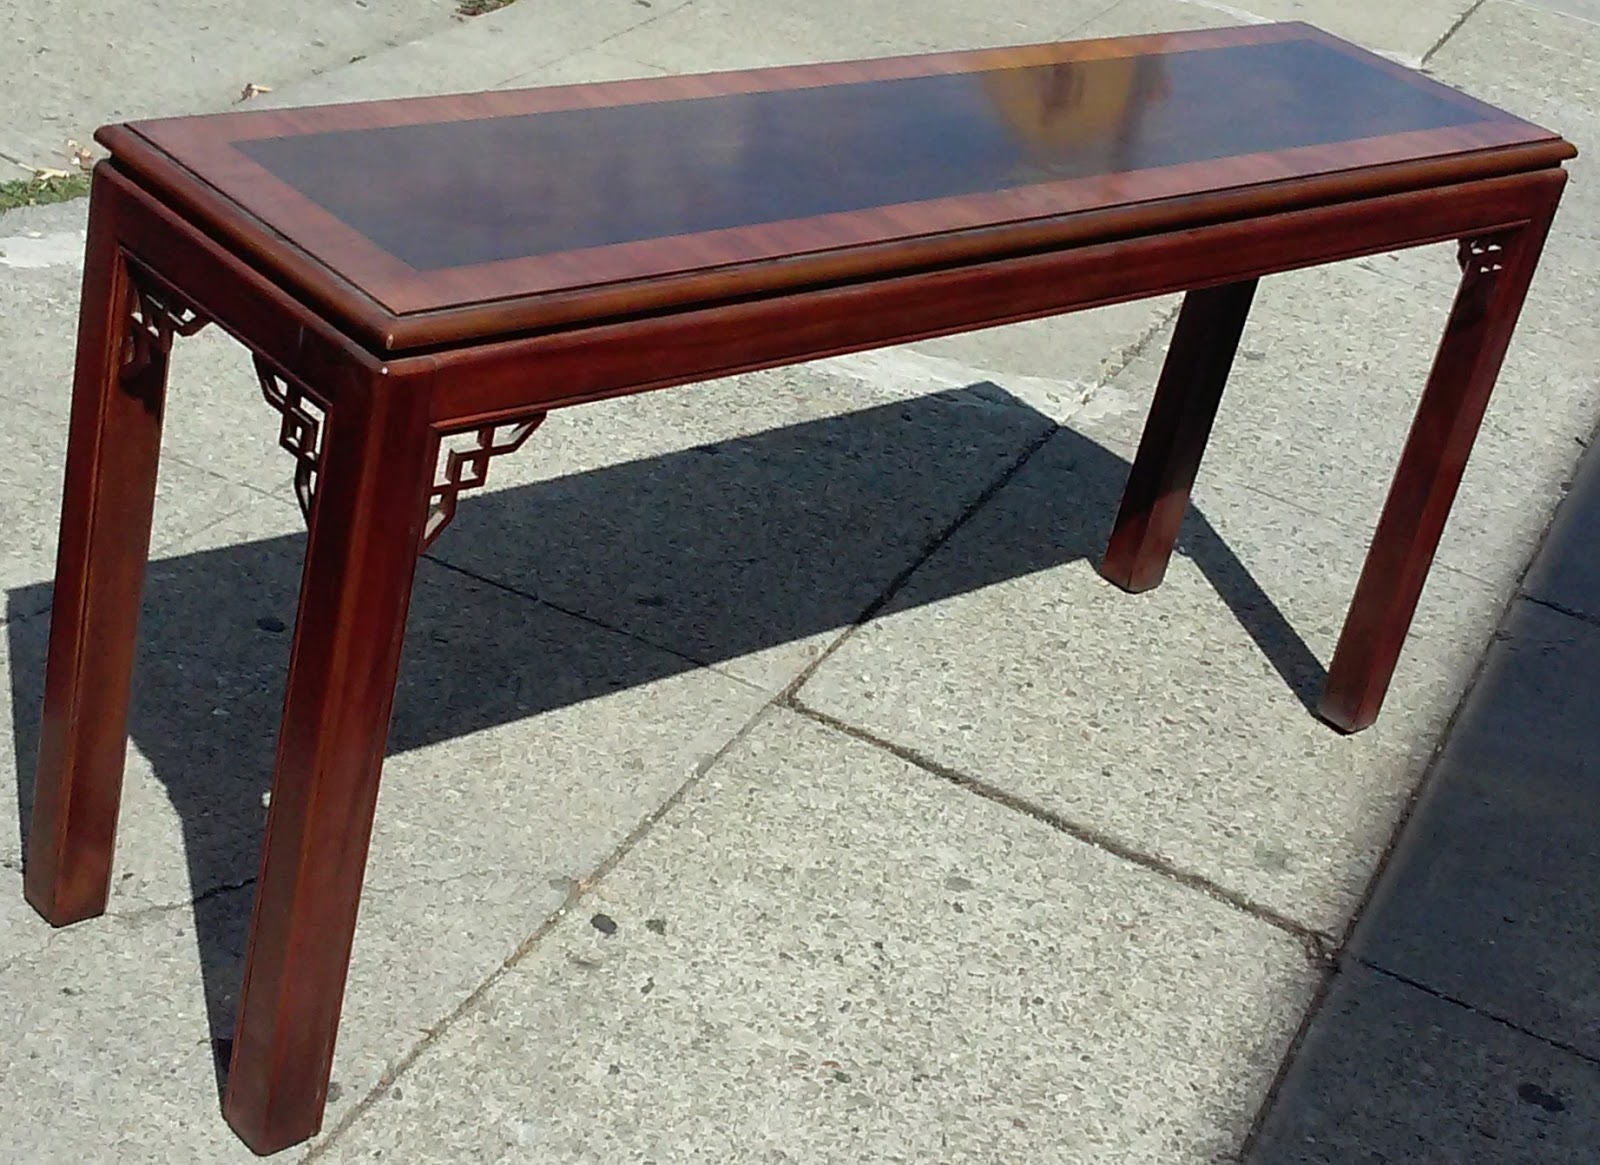 drexel sofa table cloud levitating heritage furniture the tavola for